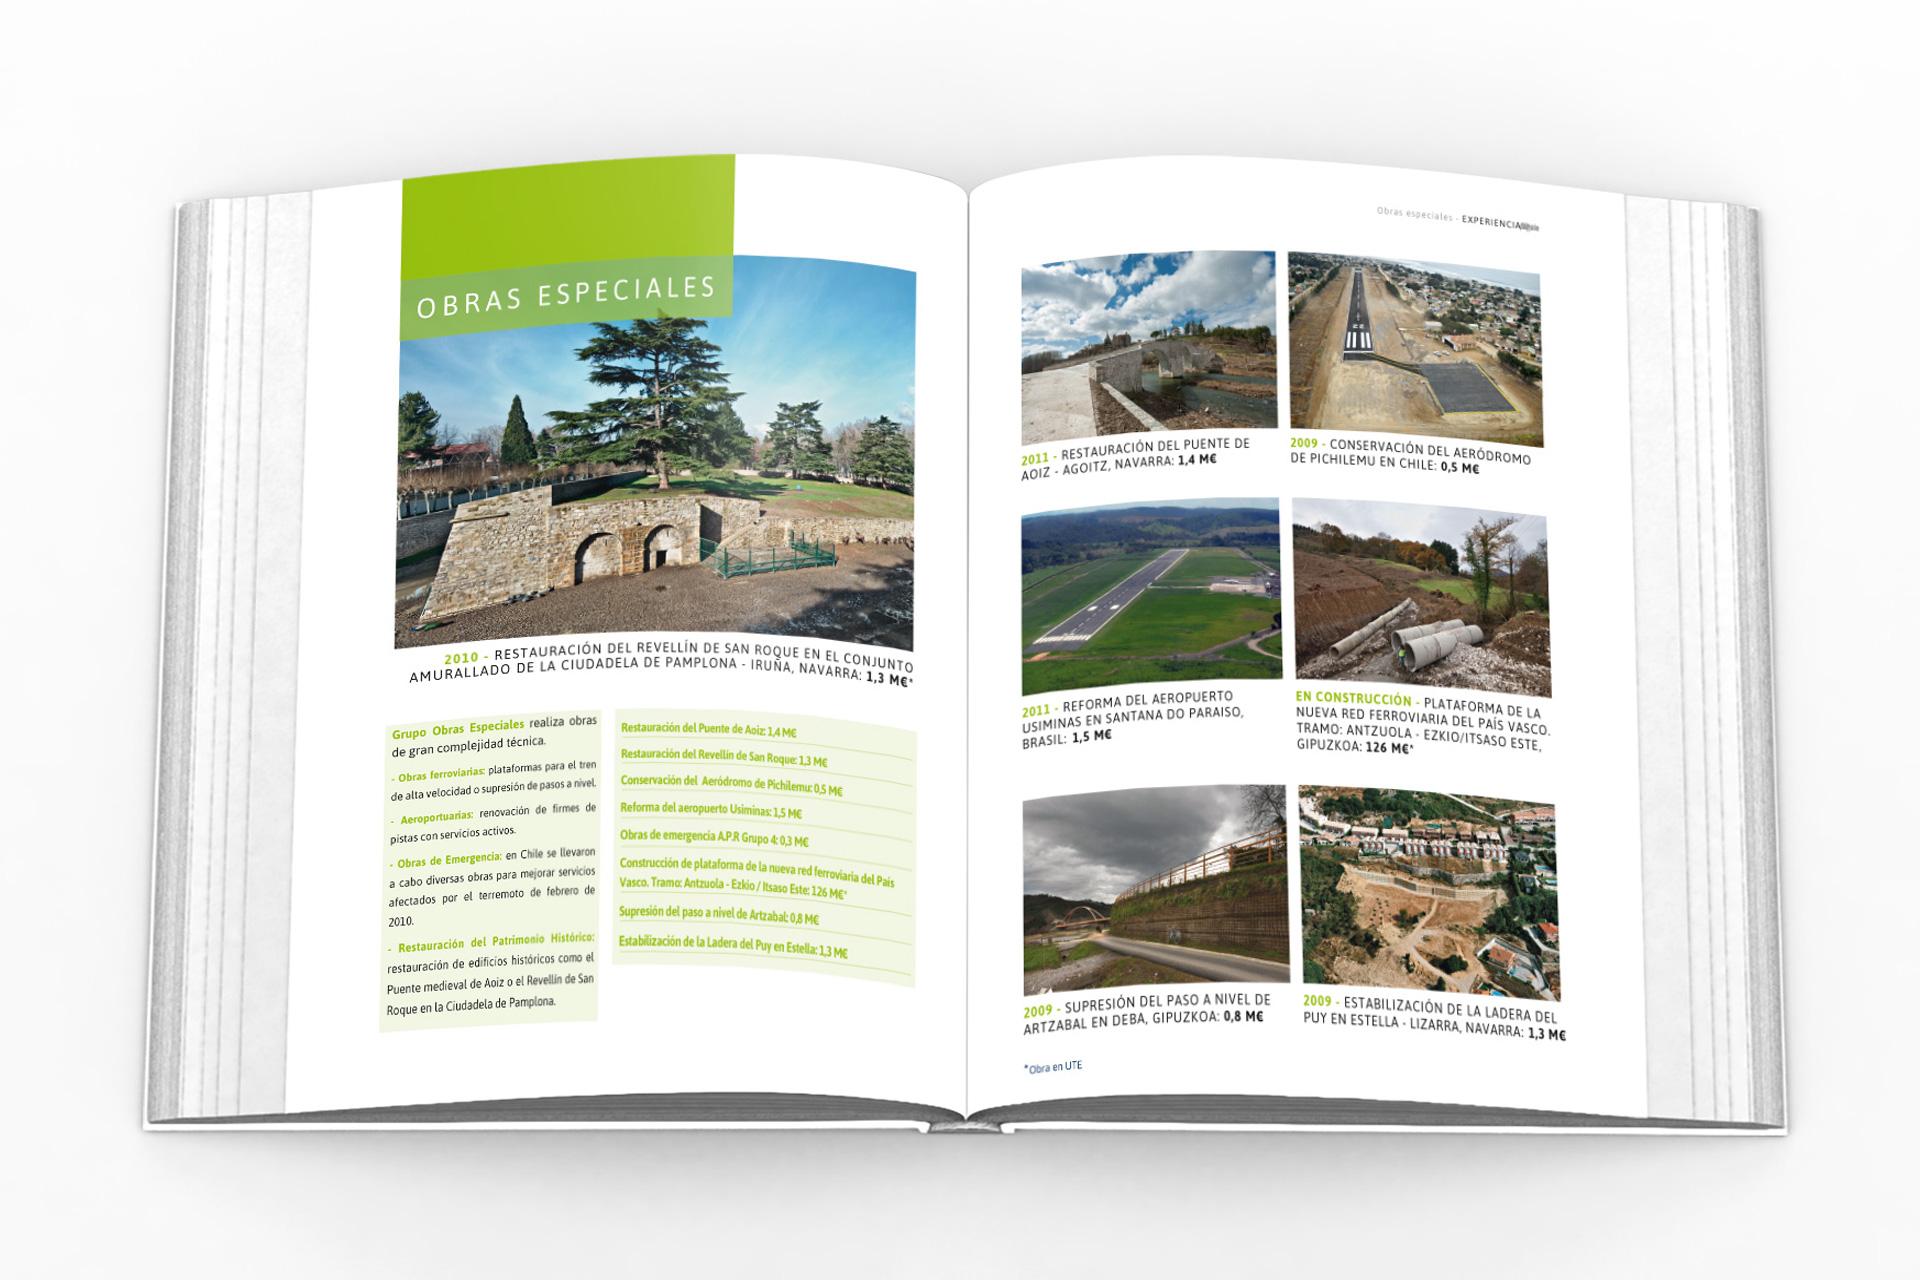 memoria anual grupo obras especiales 2011